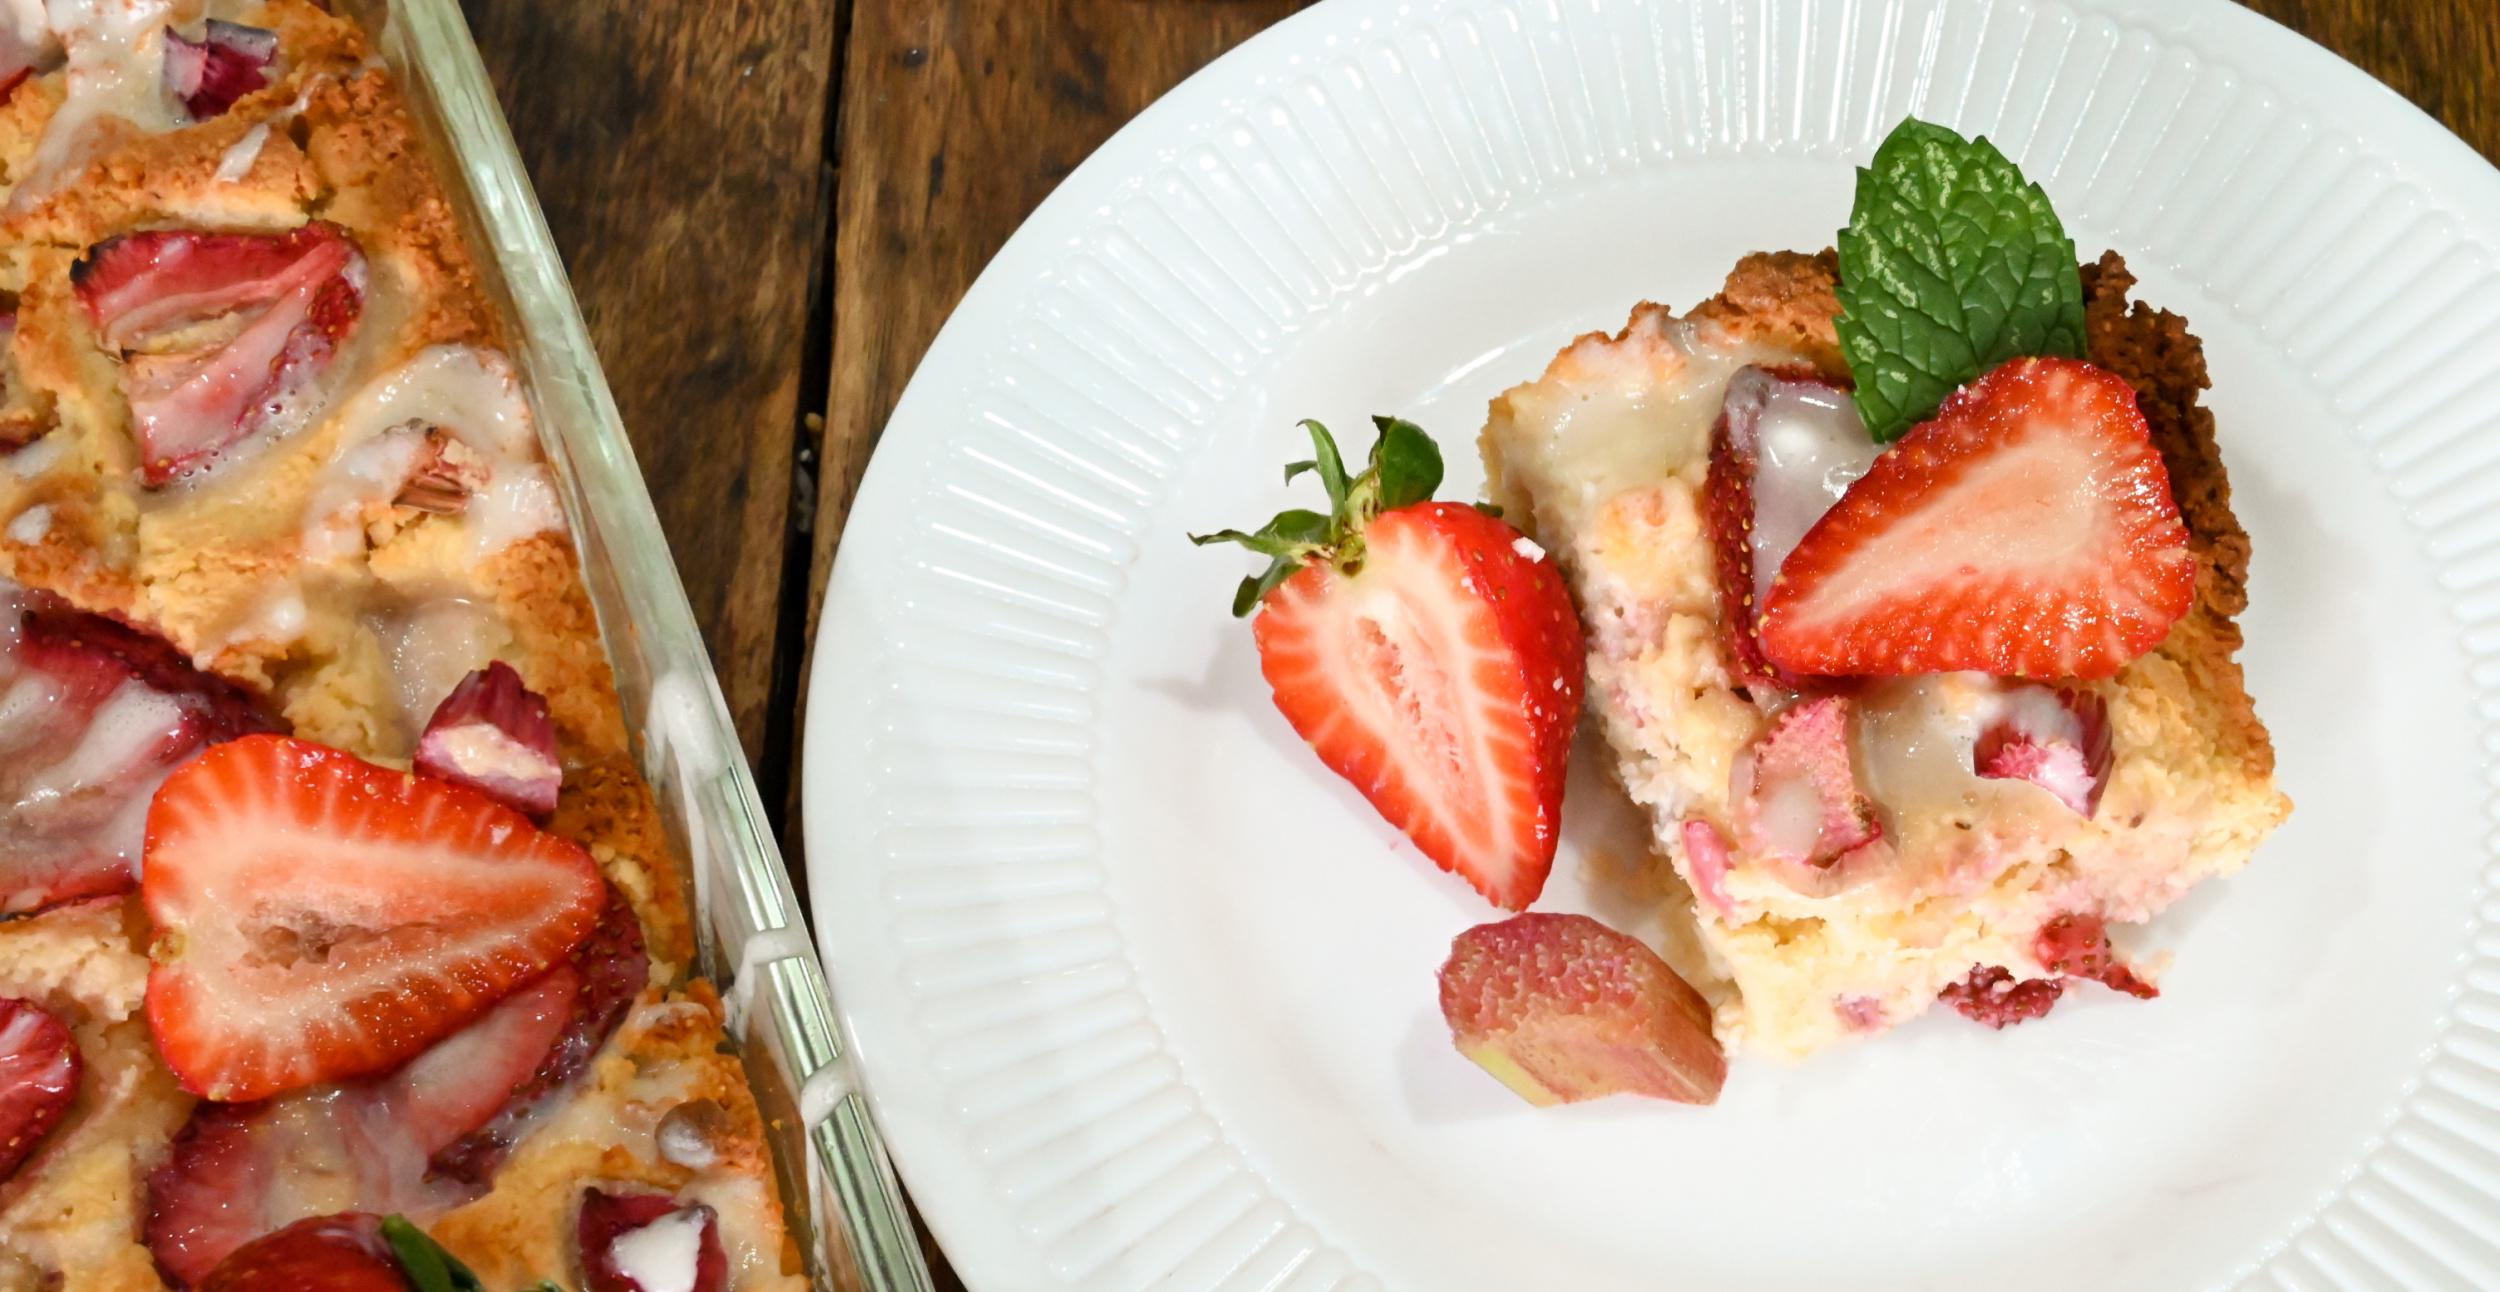 keto strawberry rhubarb cake served on a small white plate